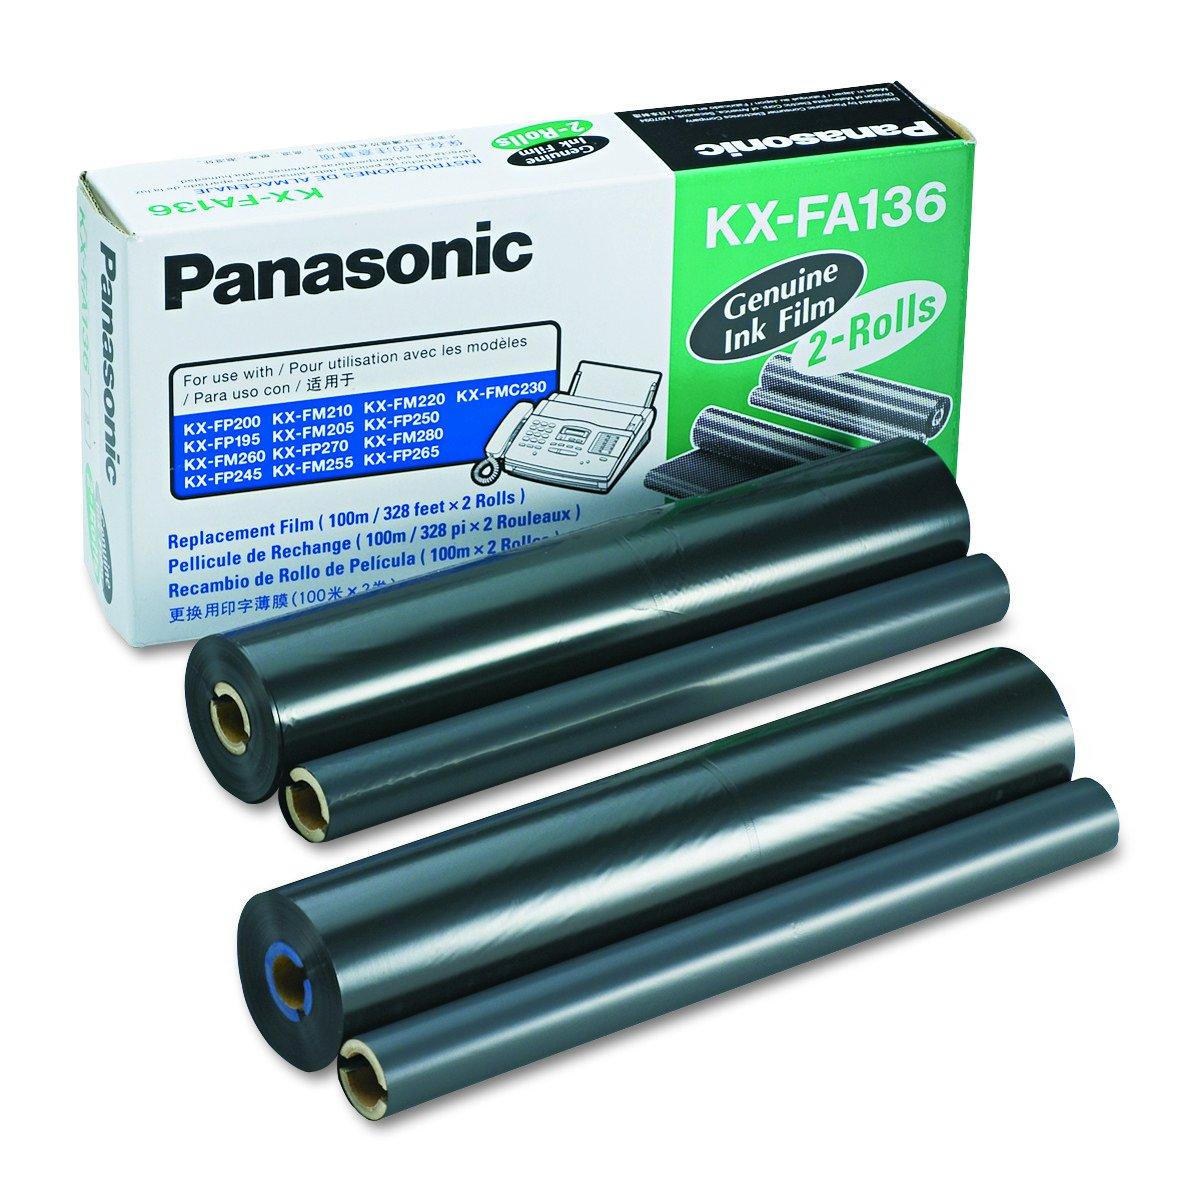 PANKXFA136 - KXFA136 Film Roll Refill Panasonic KX-FA136